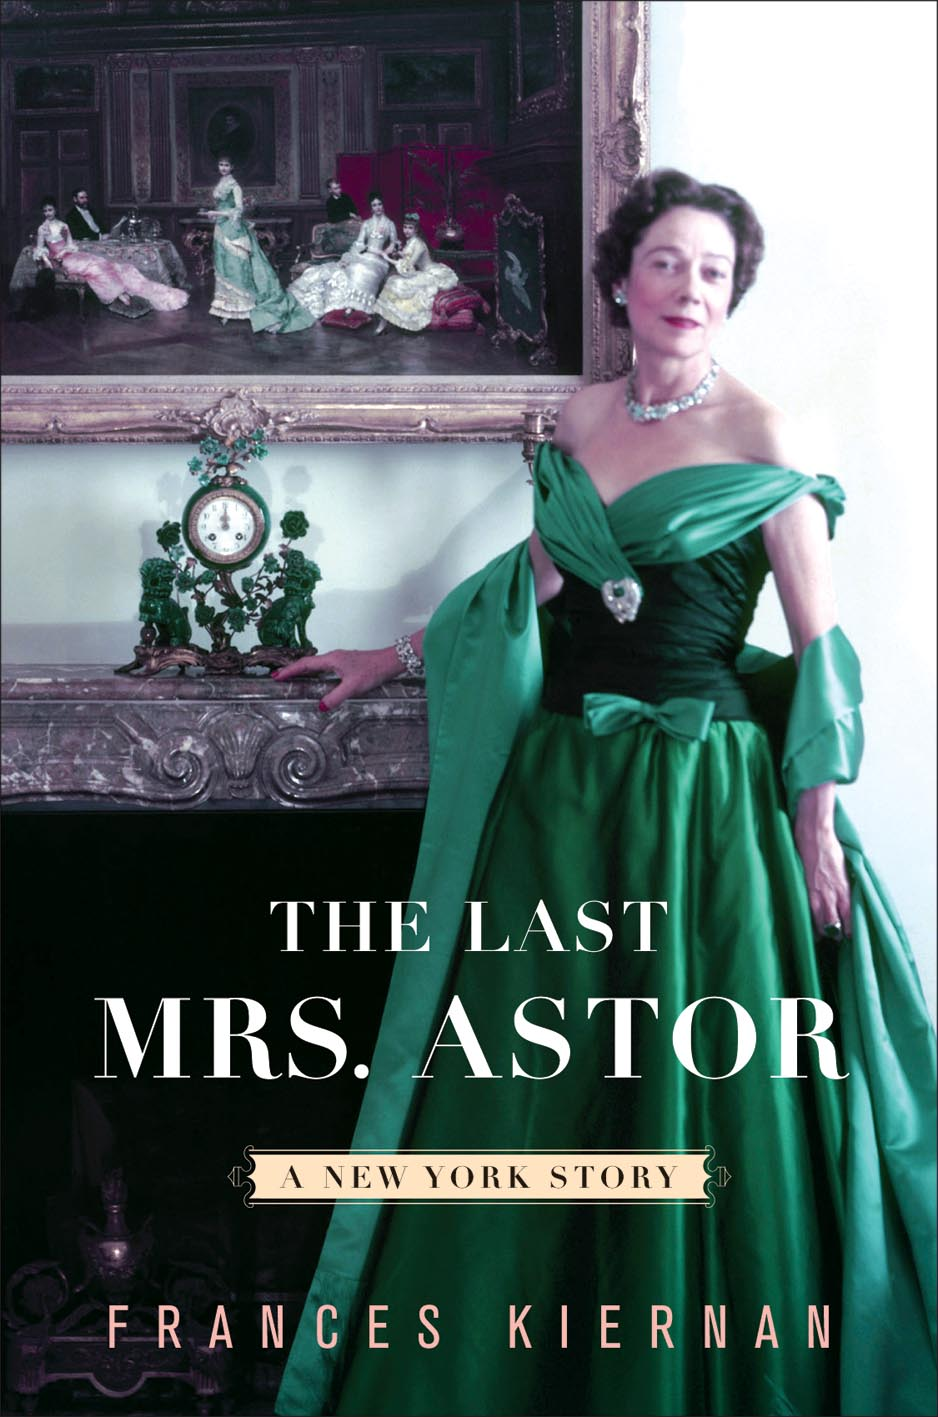 The Last Mrs. Astor